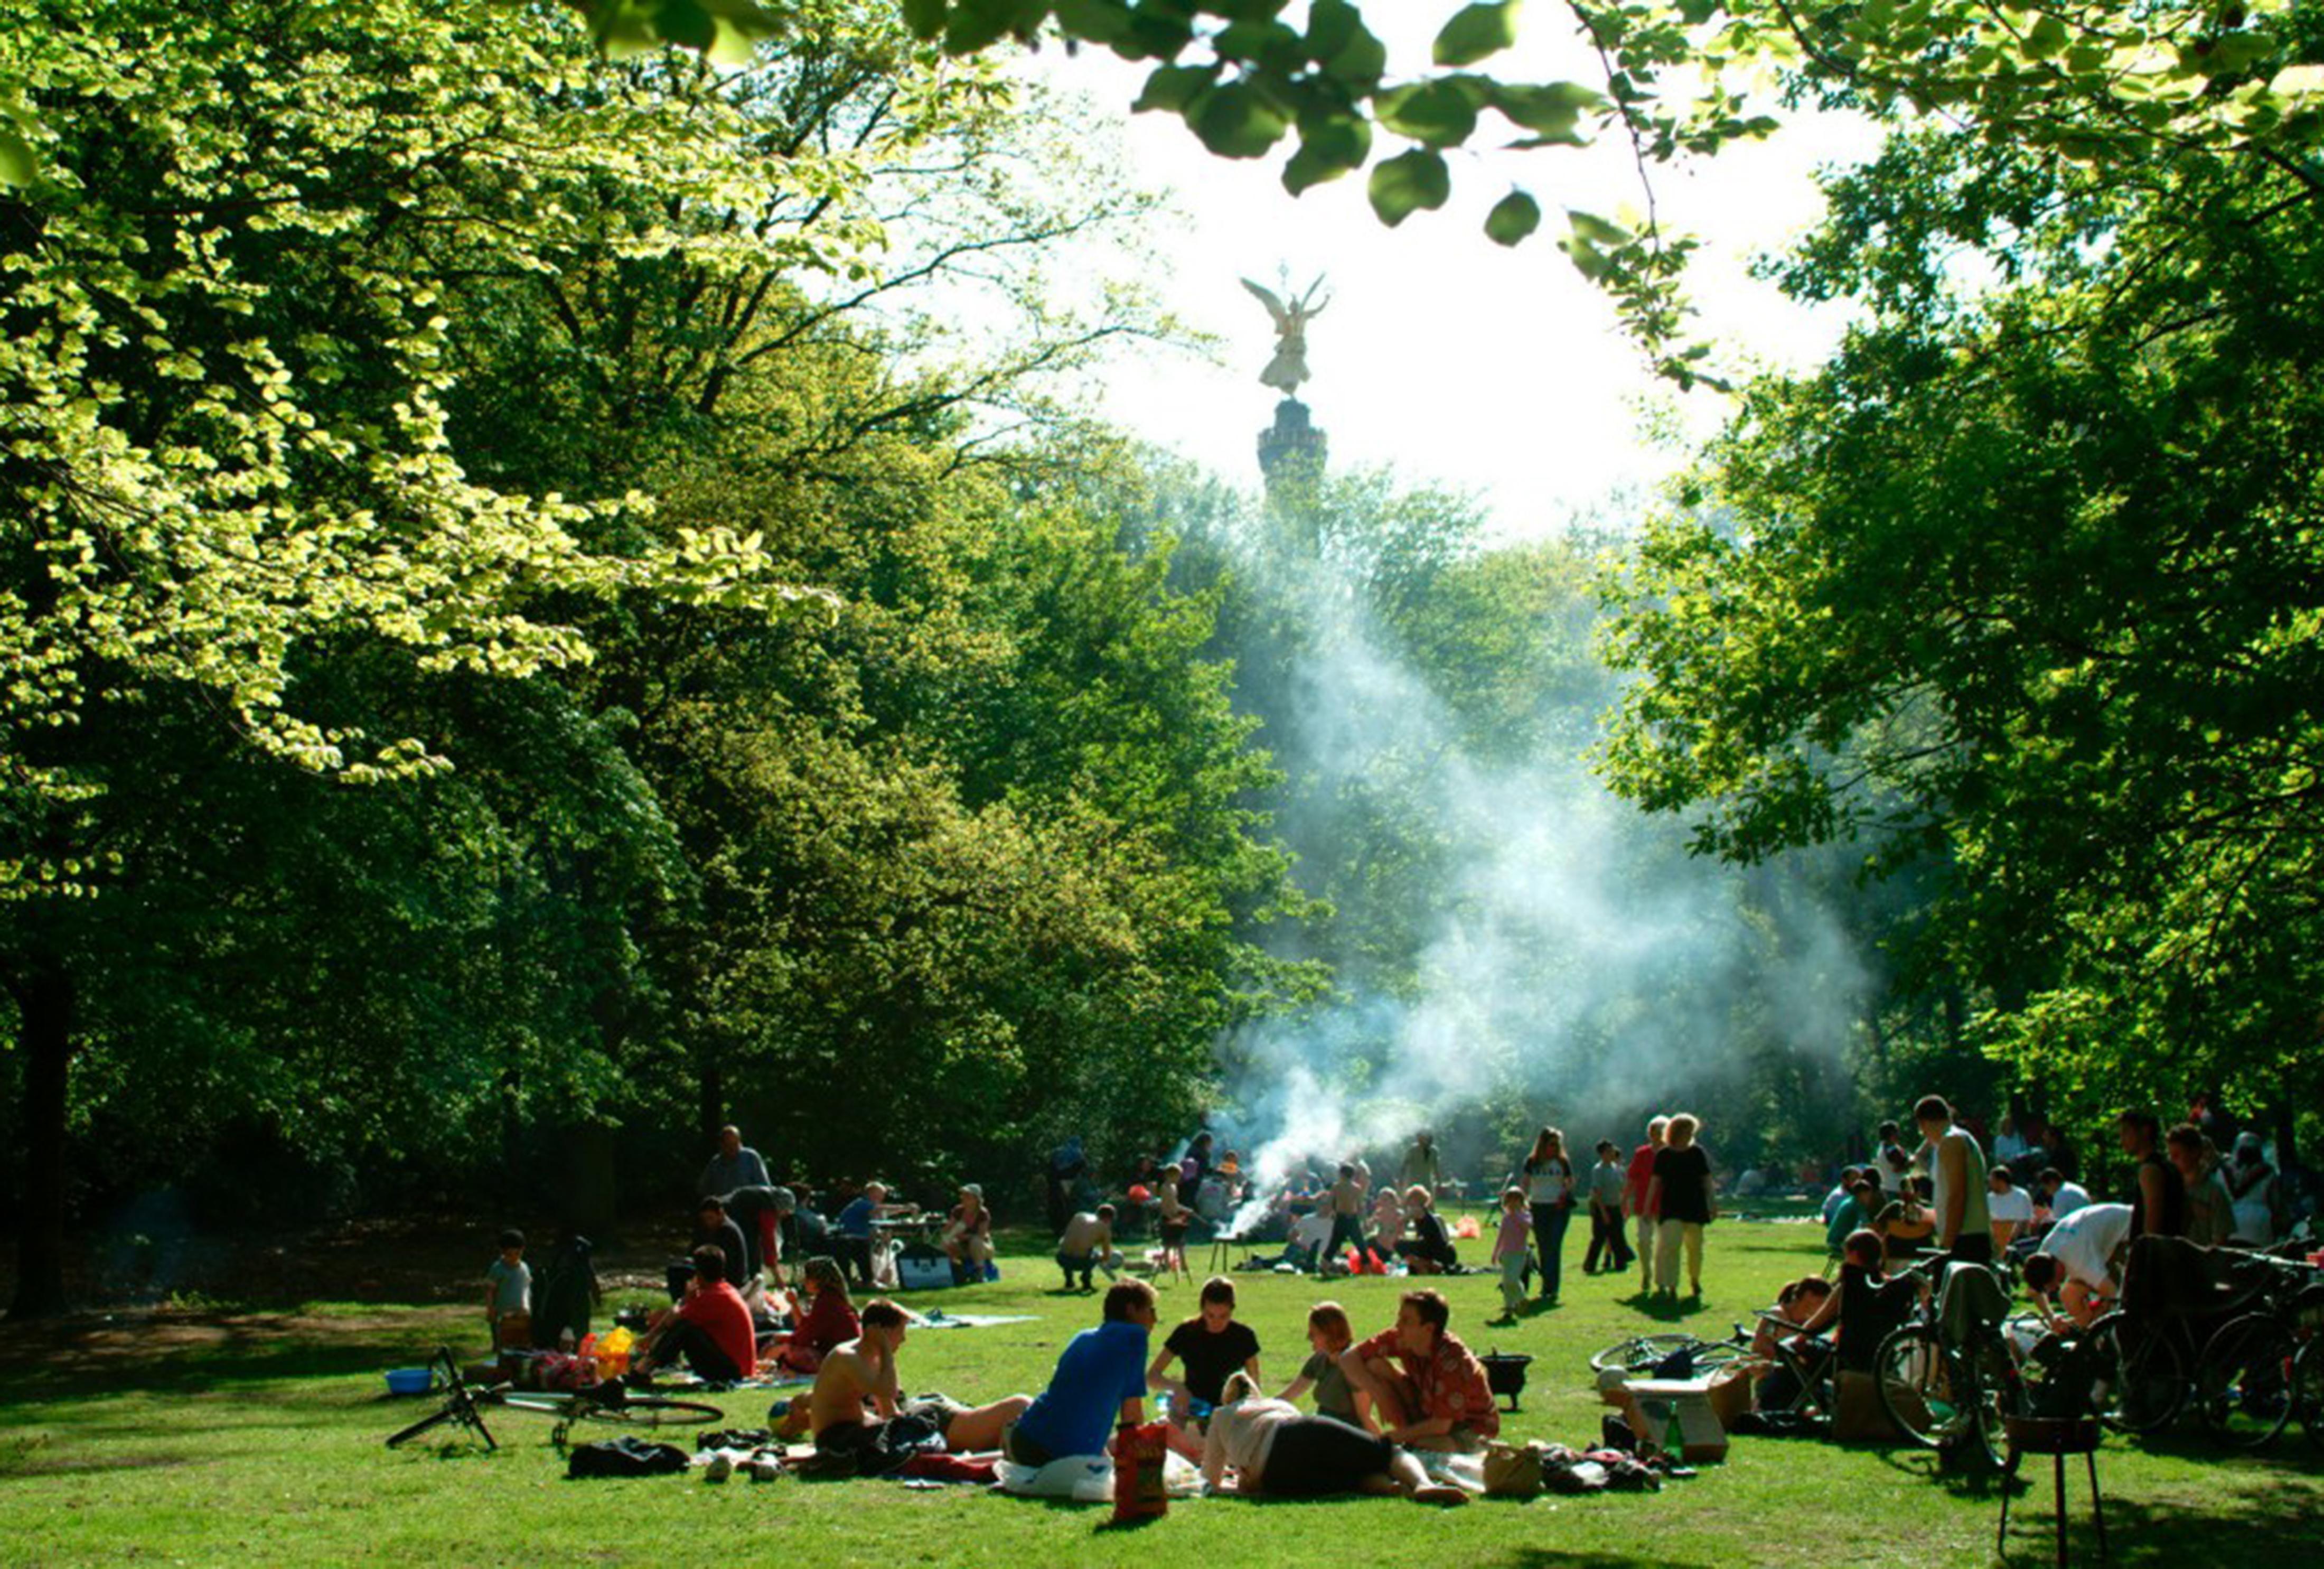 tiergarten-berlin-berlino-alessia-canella-styleshouts